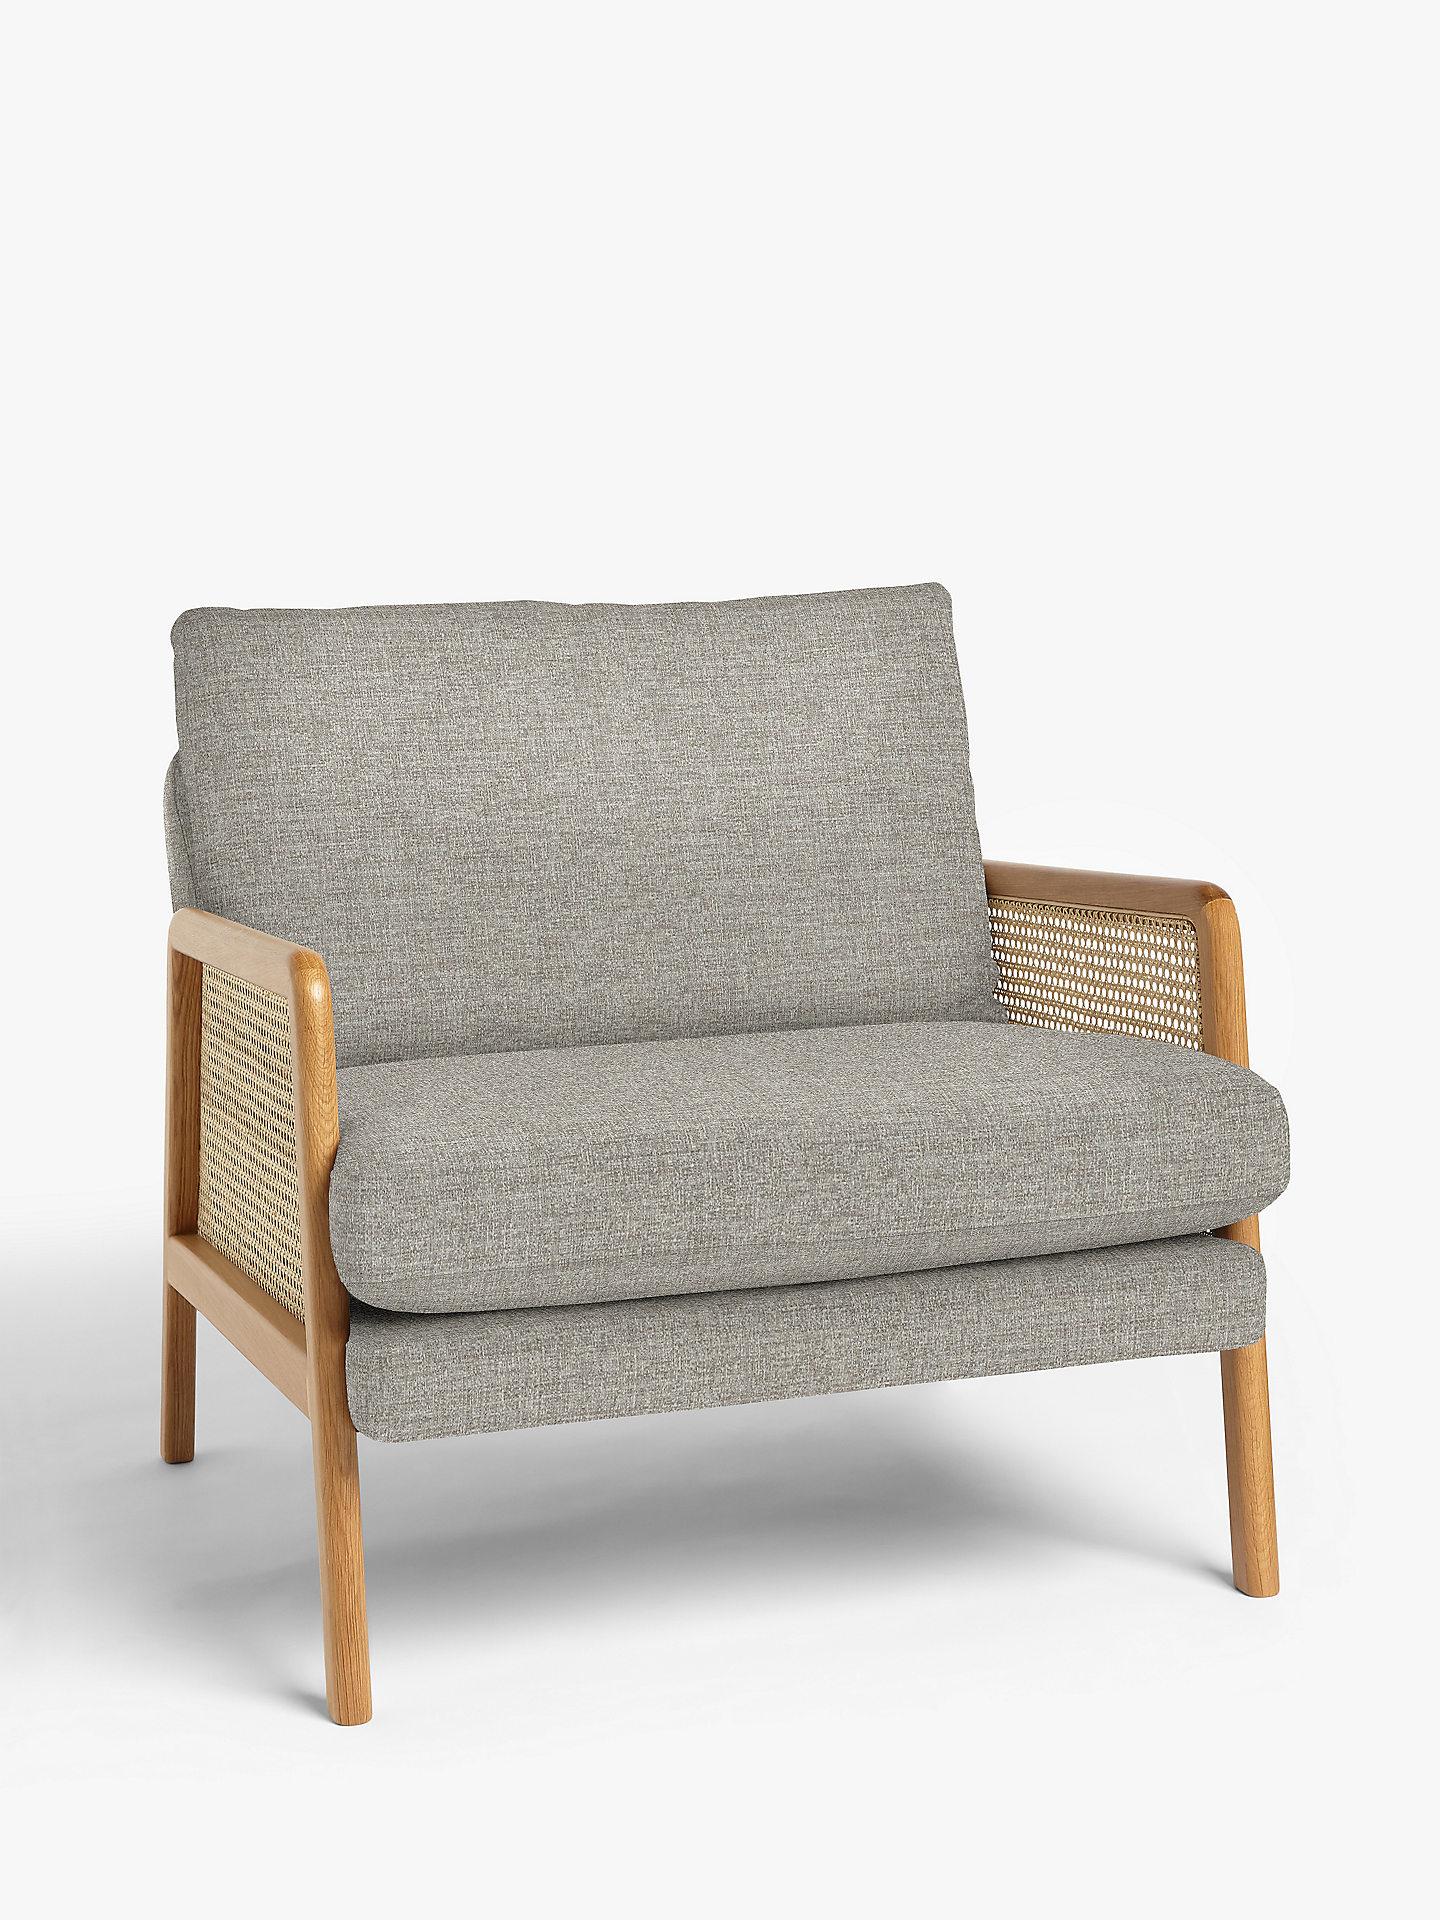 Buy John Lewis & Partners Cane Accent Armchair, Light Leg Online at johnlewis.com